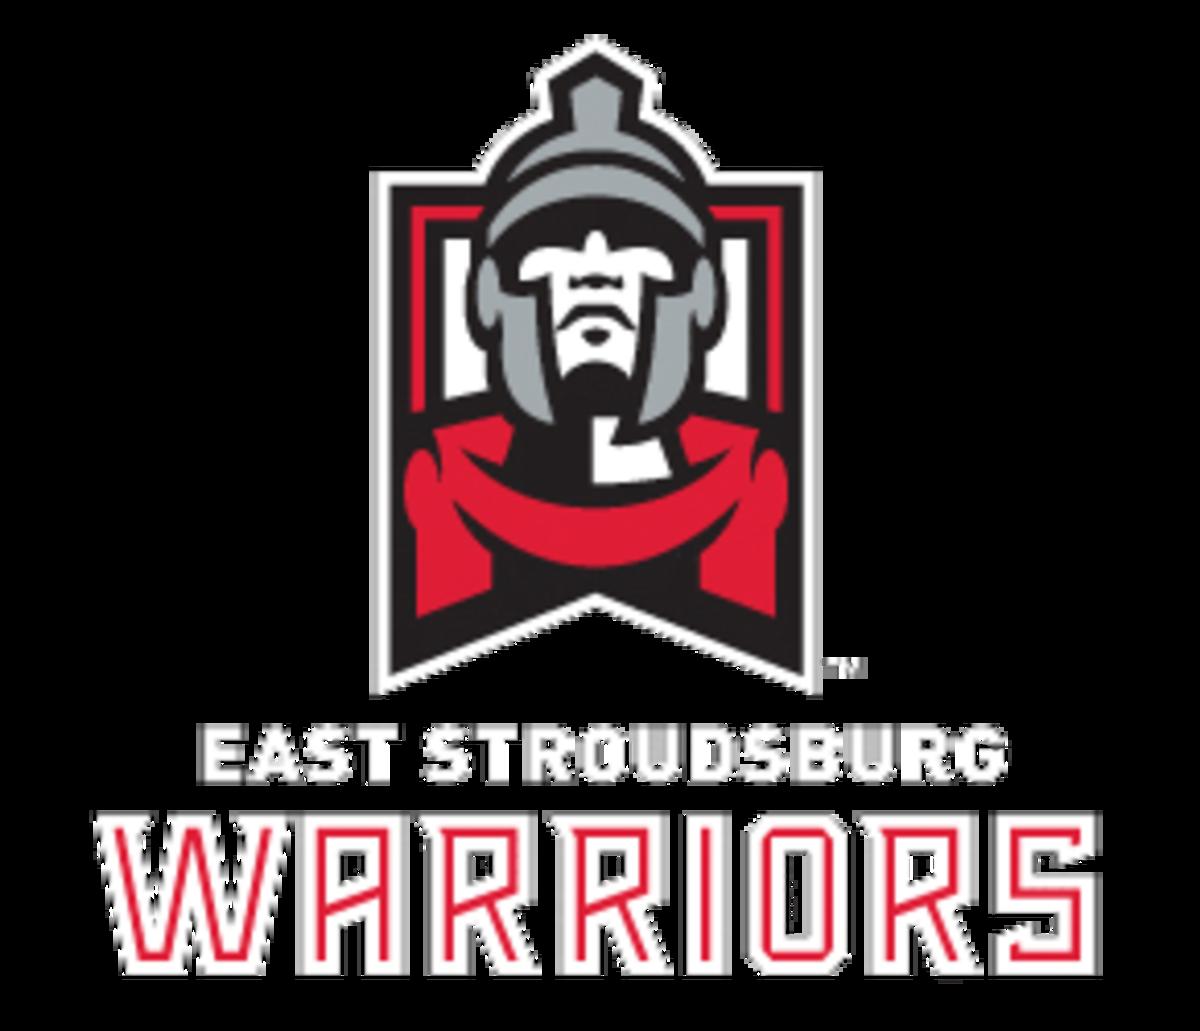 EastStroudsburg1